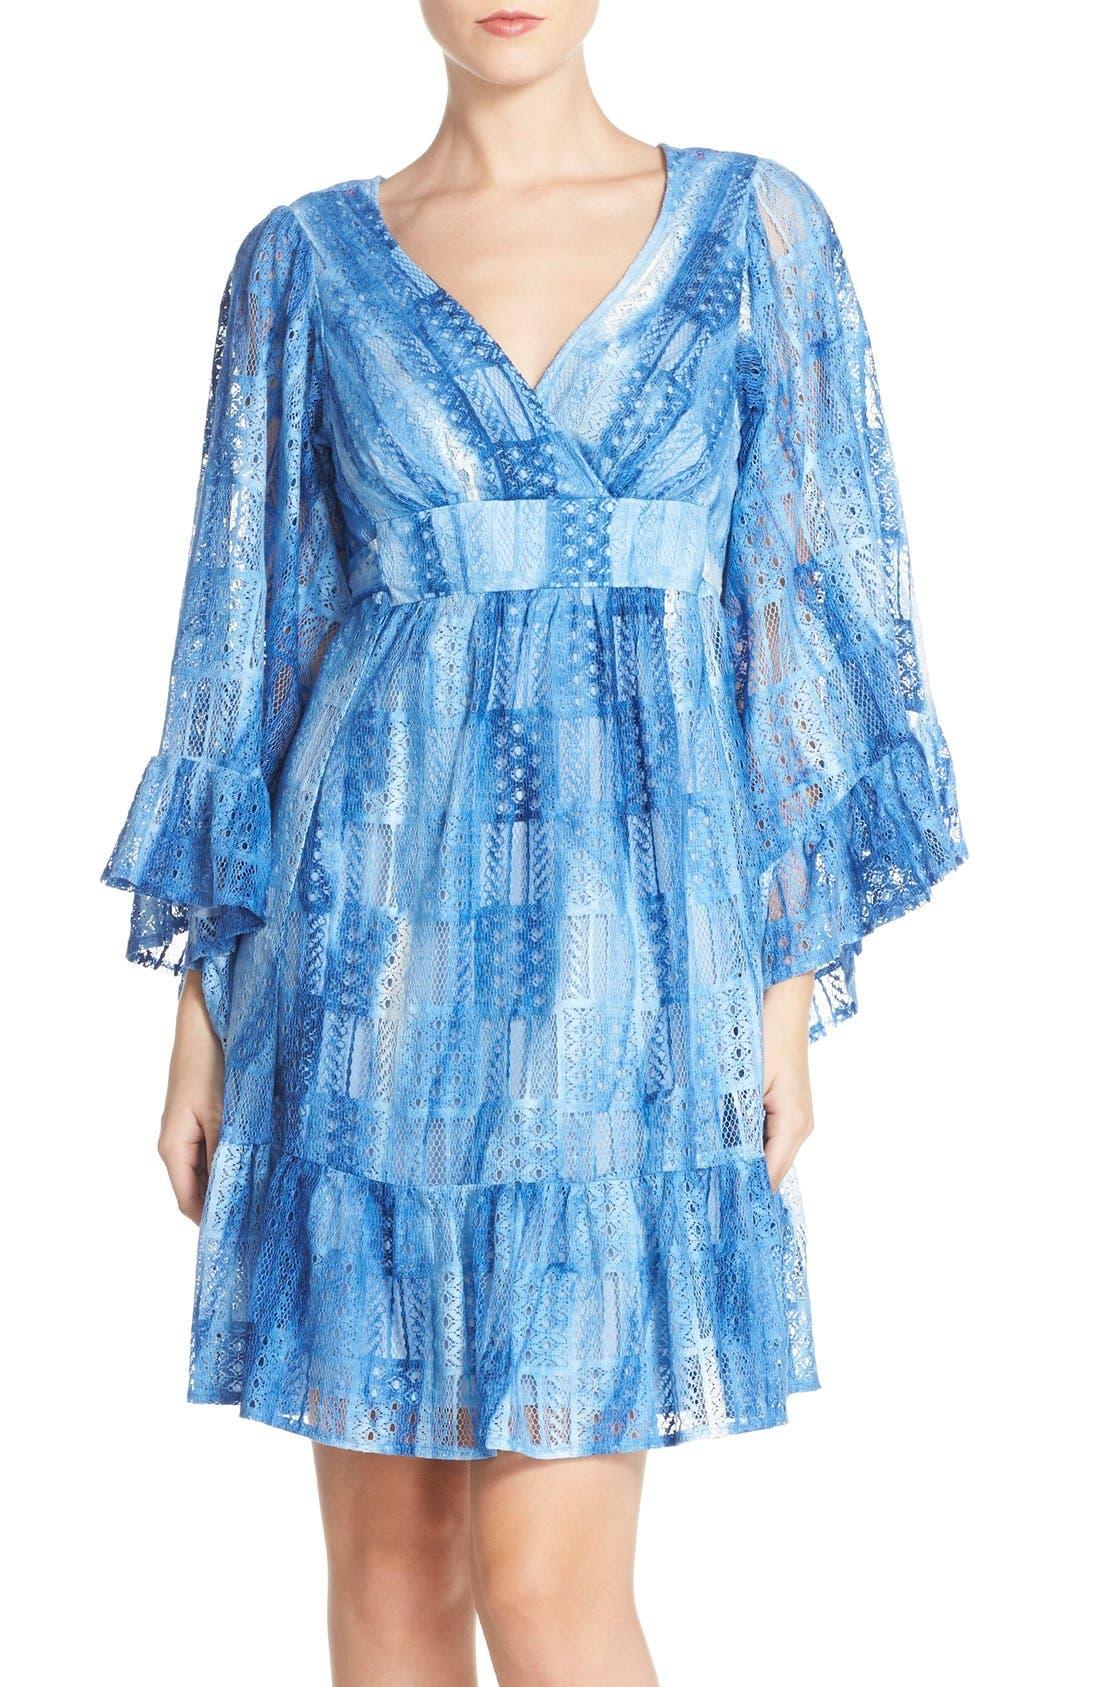 Alternate Image 1 Selected - Betsey Johnson Cotton Blend Babydoll Dress